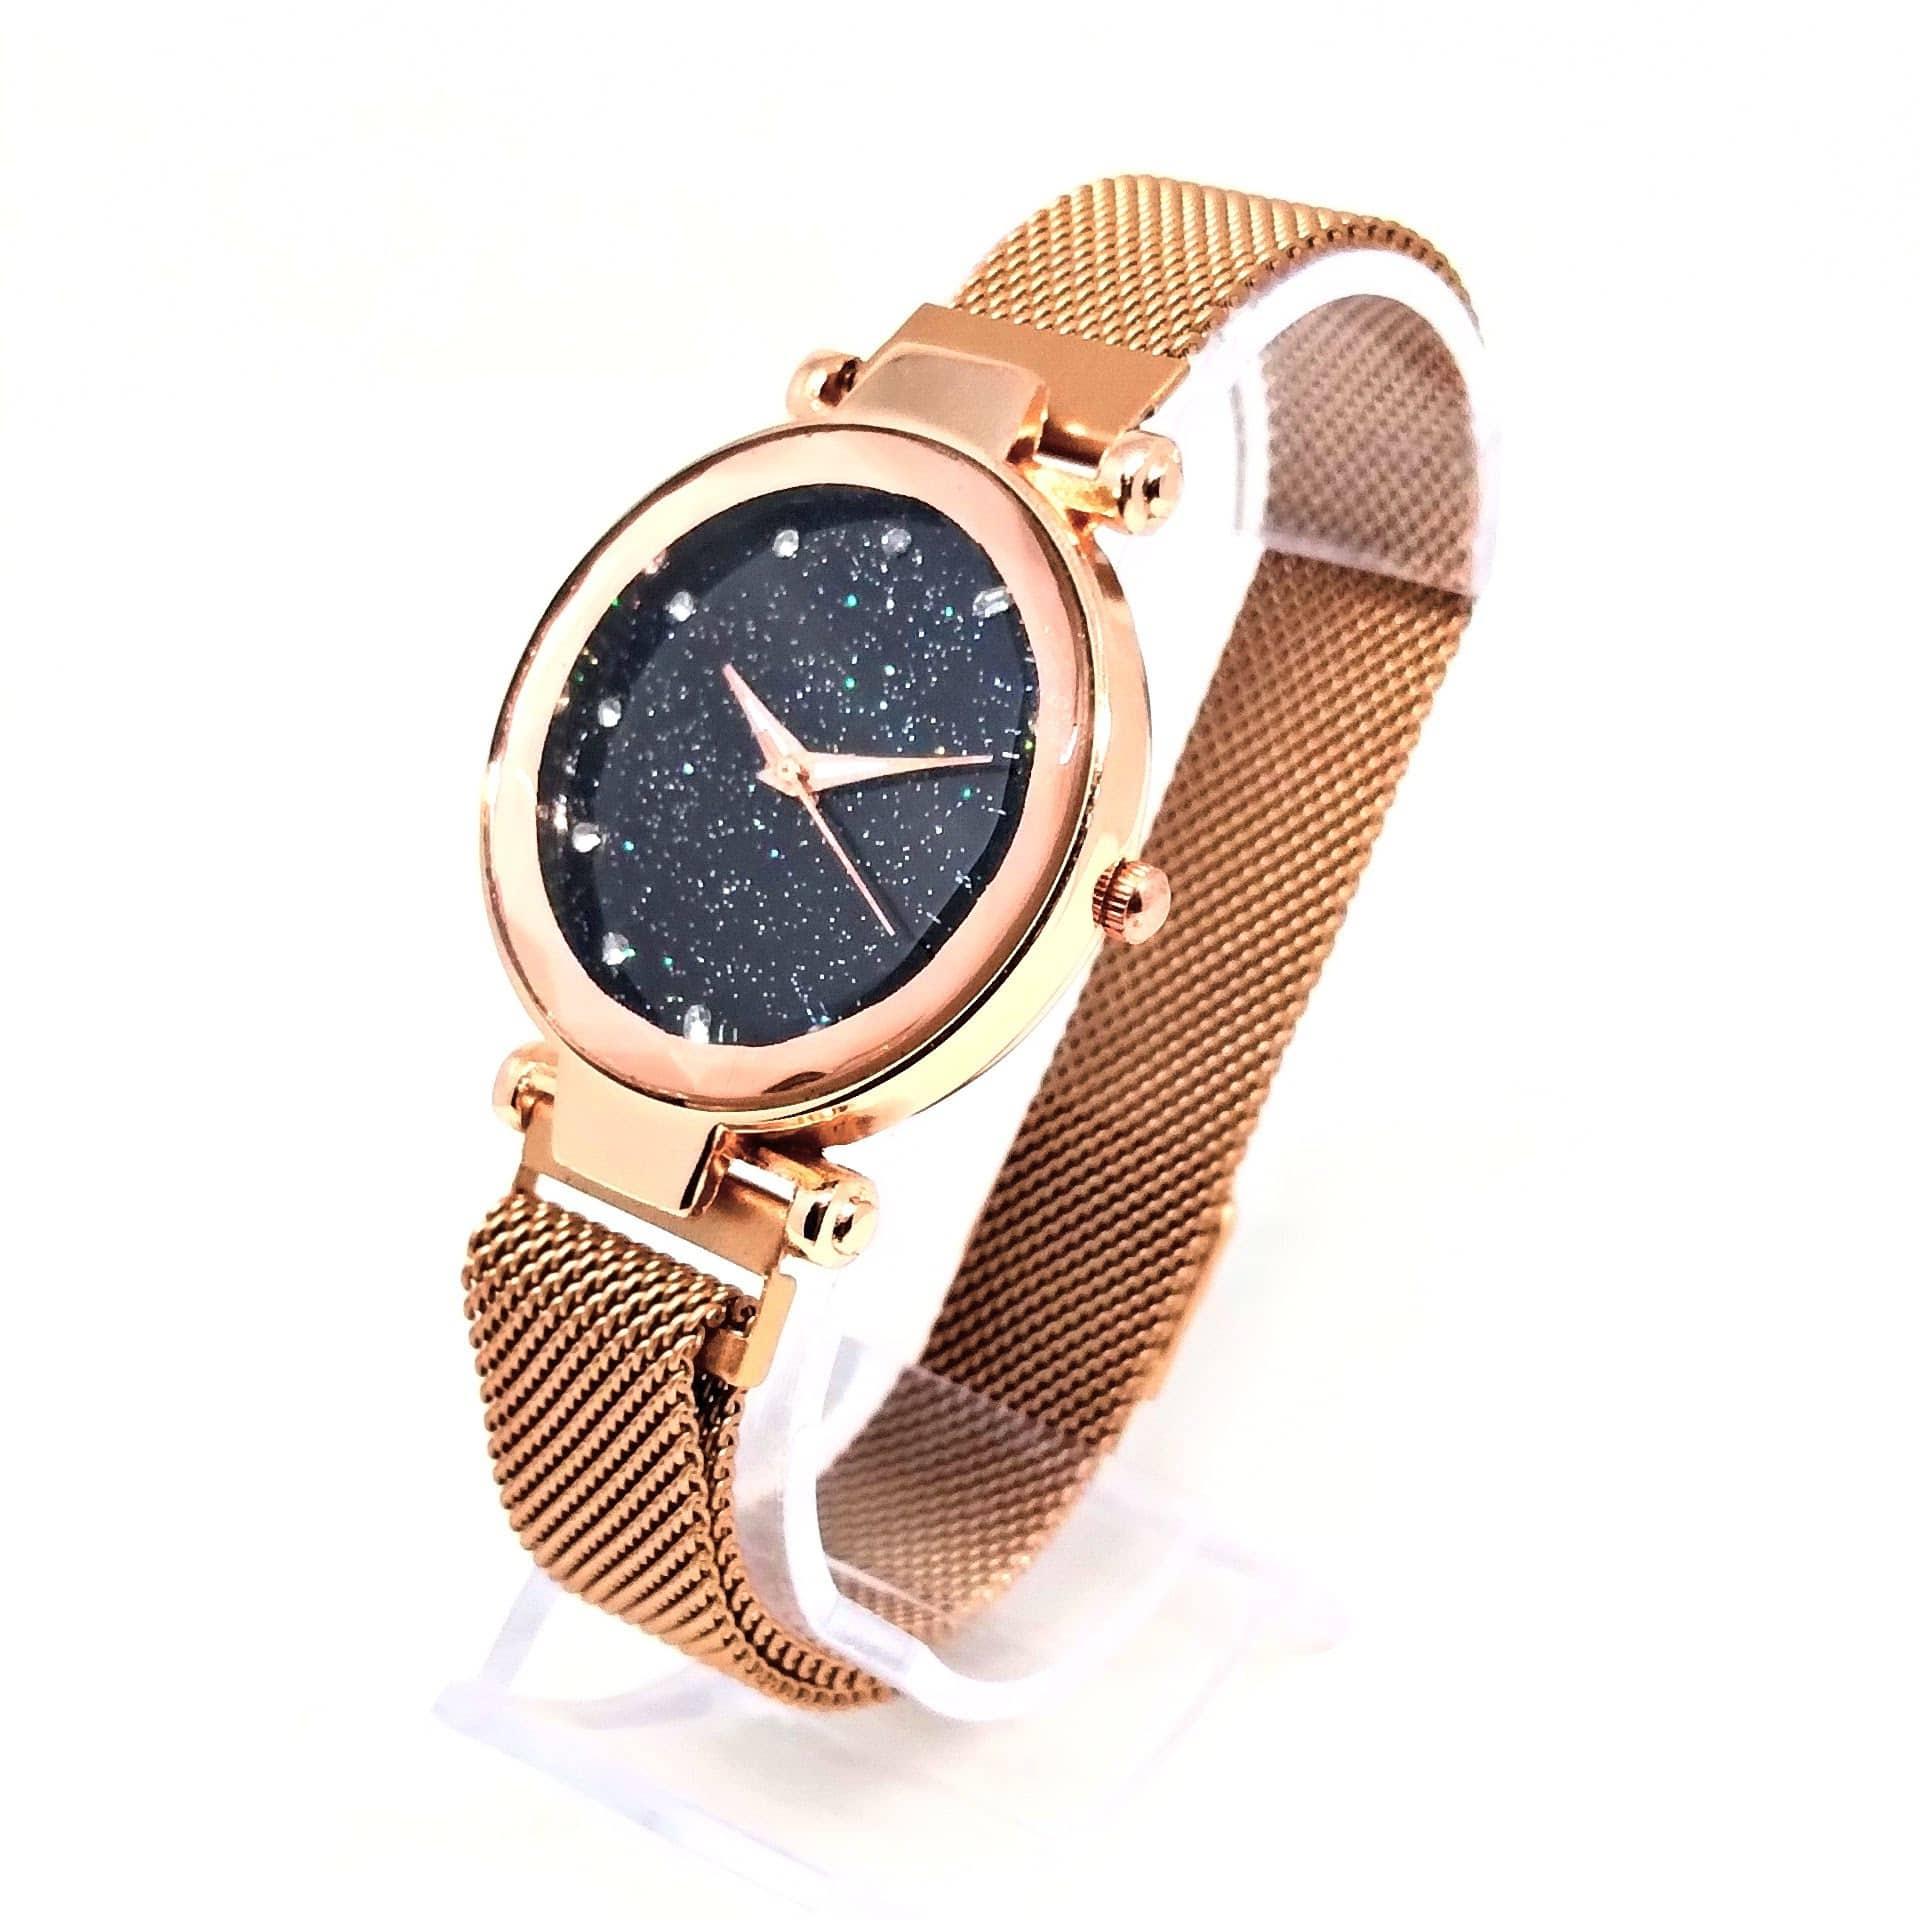 Relógio Feminino Social Strass Estrelado Luxo Lova